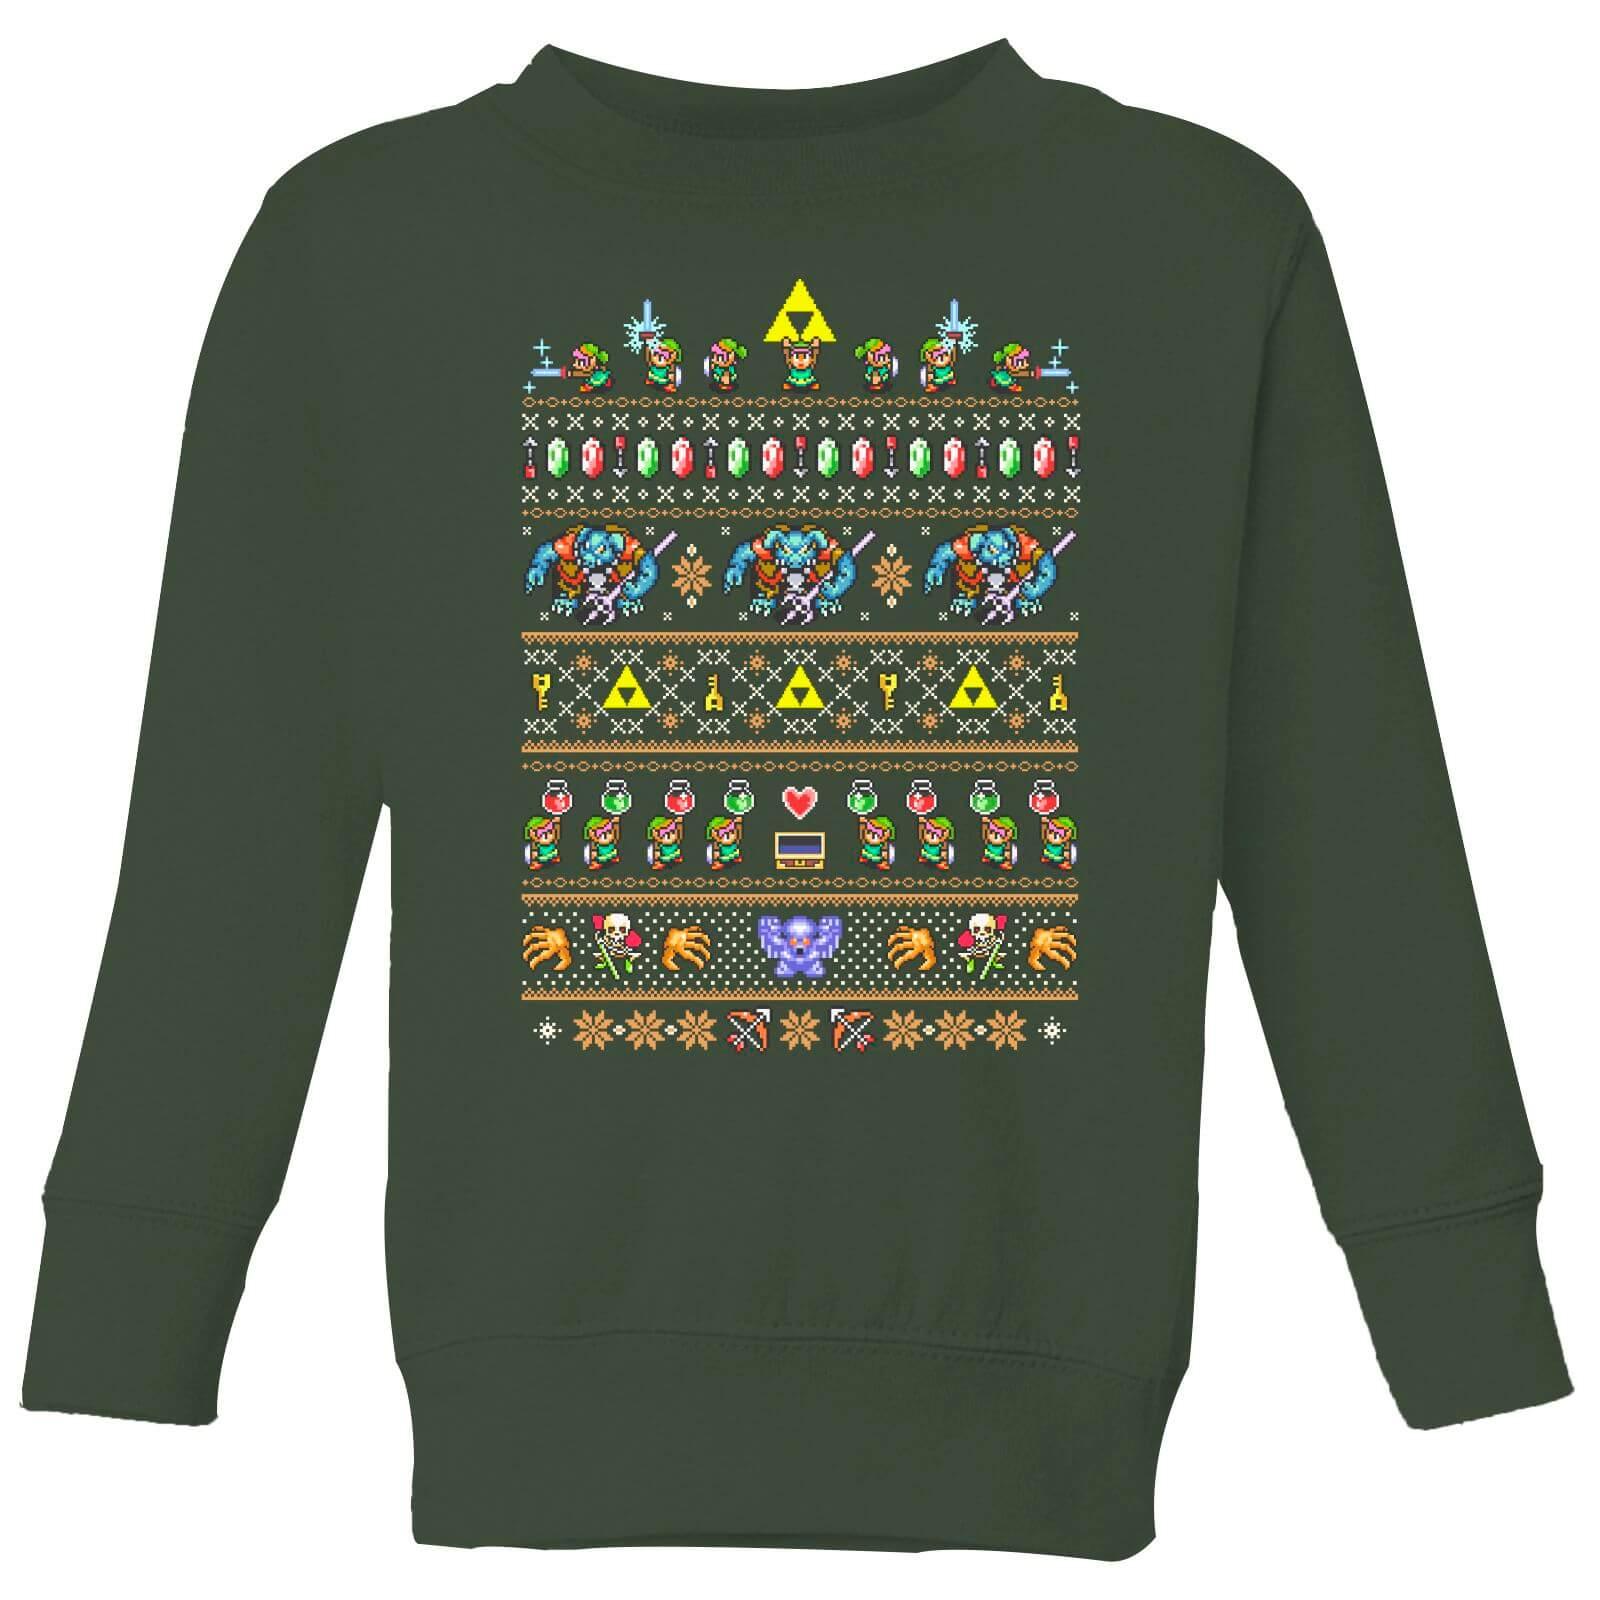 Nintendo Super Mario Retro Kid's Christmas Sweatshirt - Forest Green - 11-12 Jahre - Forest Green